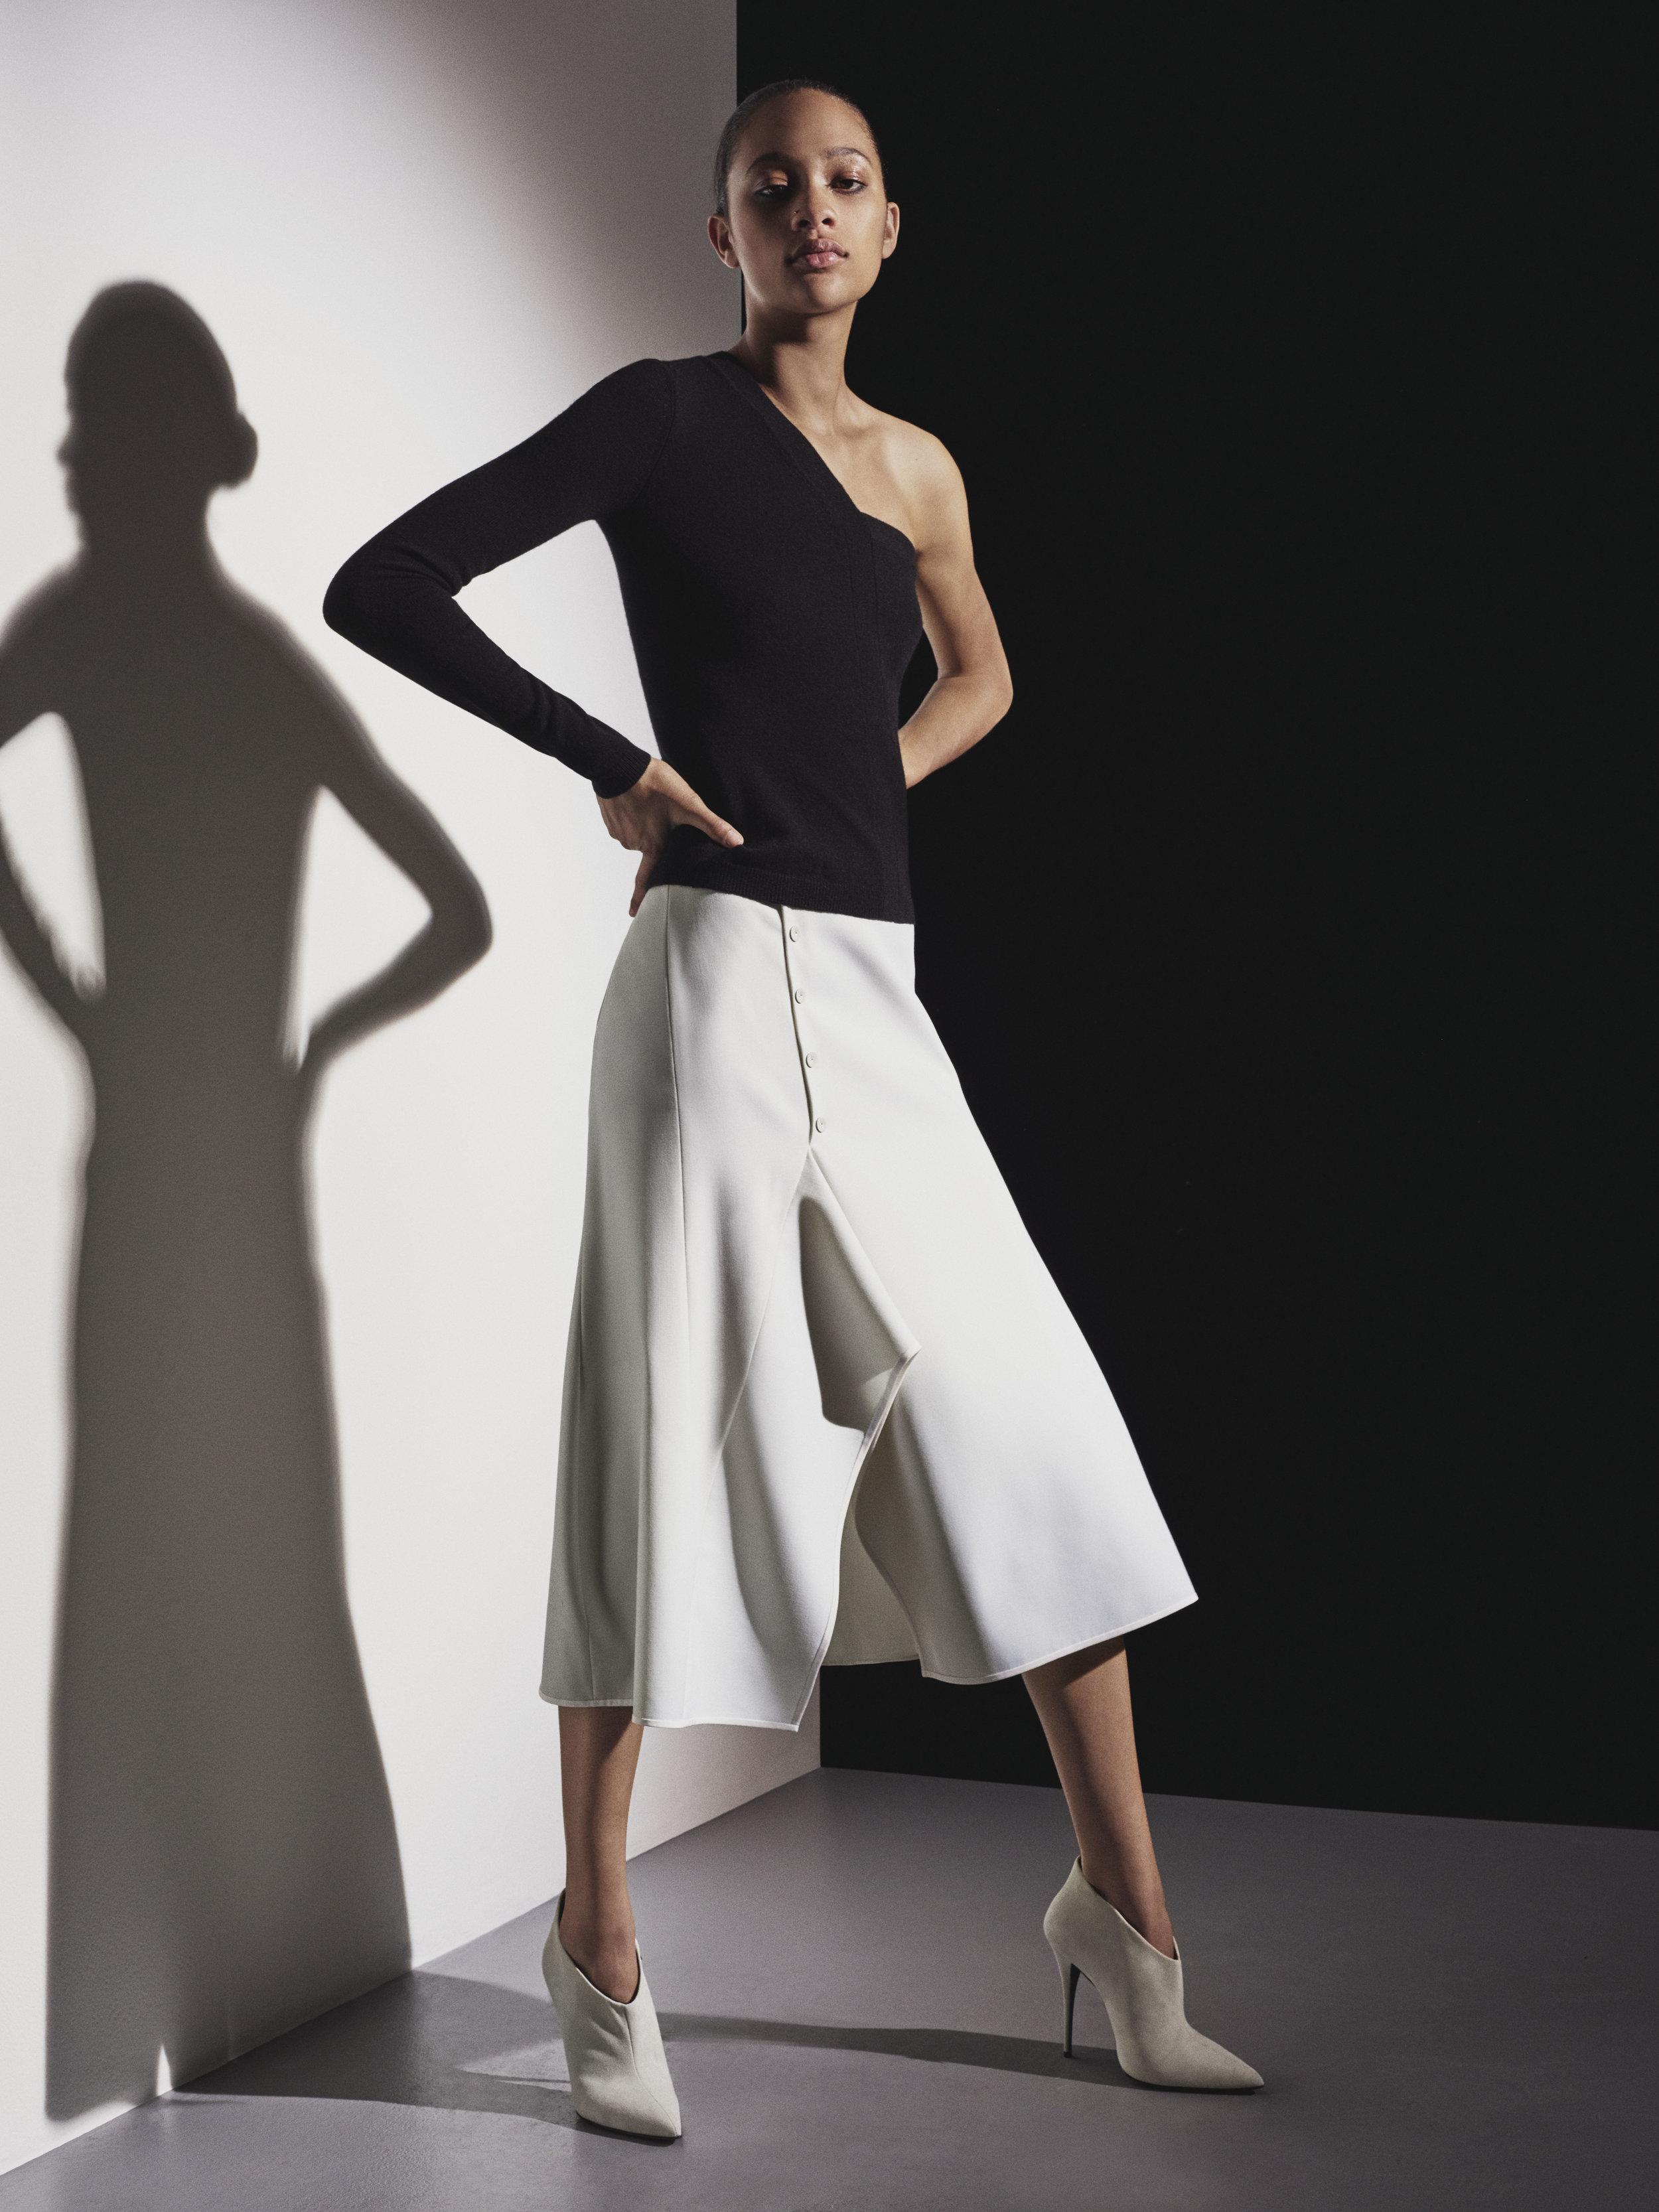 Look 10 Black one-shoulder knit top with white wool gabardine skirt.